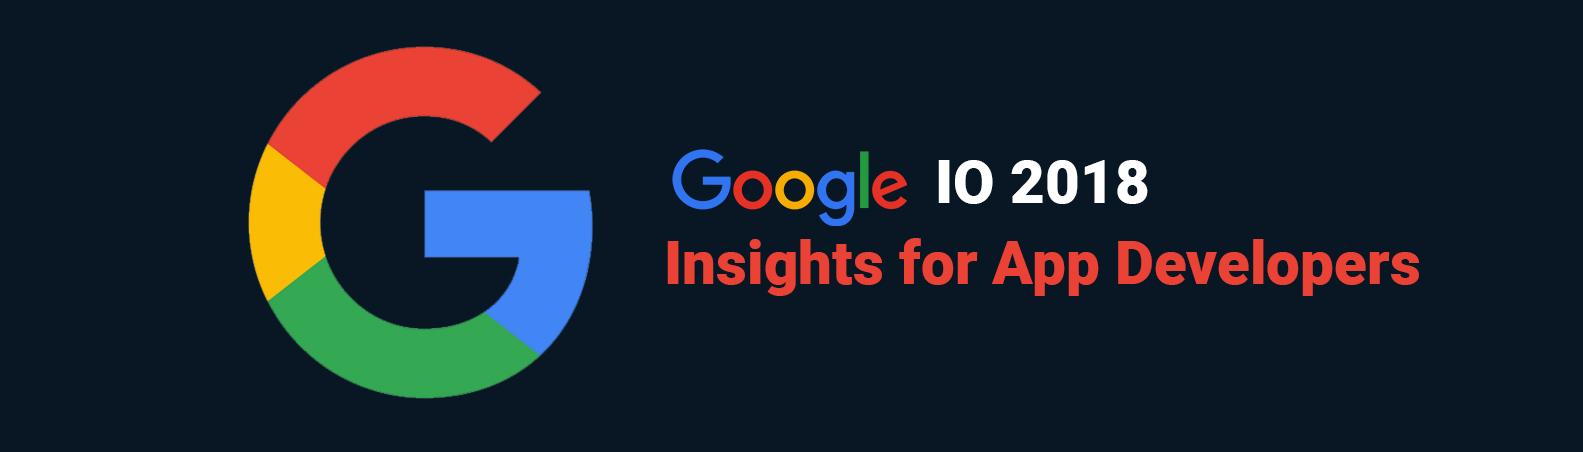 Google I/O 2018: Insights for App Developer